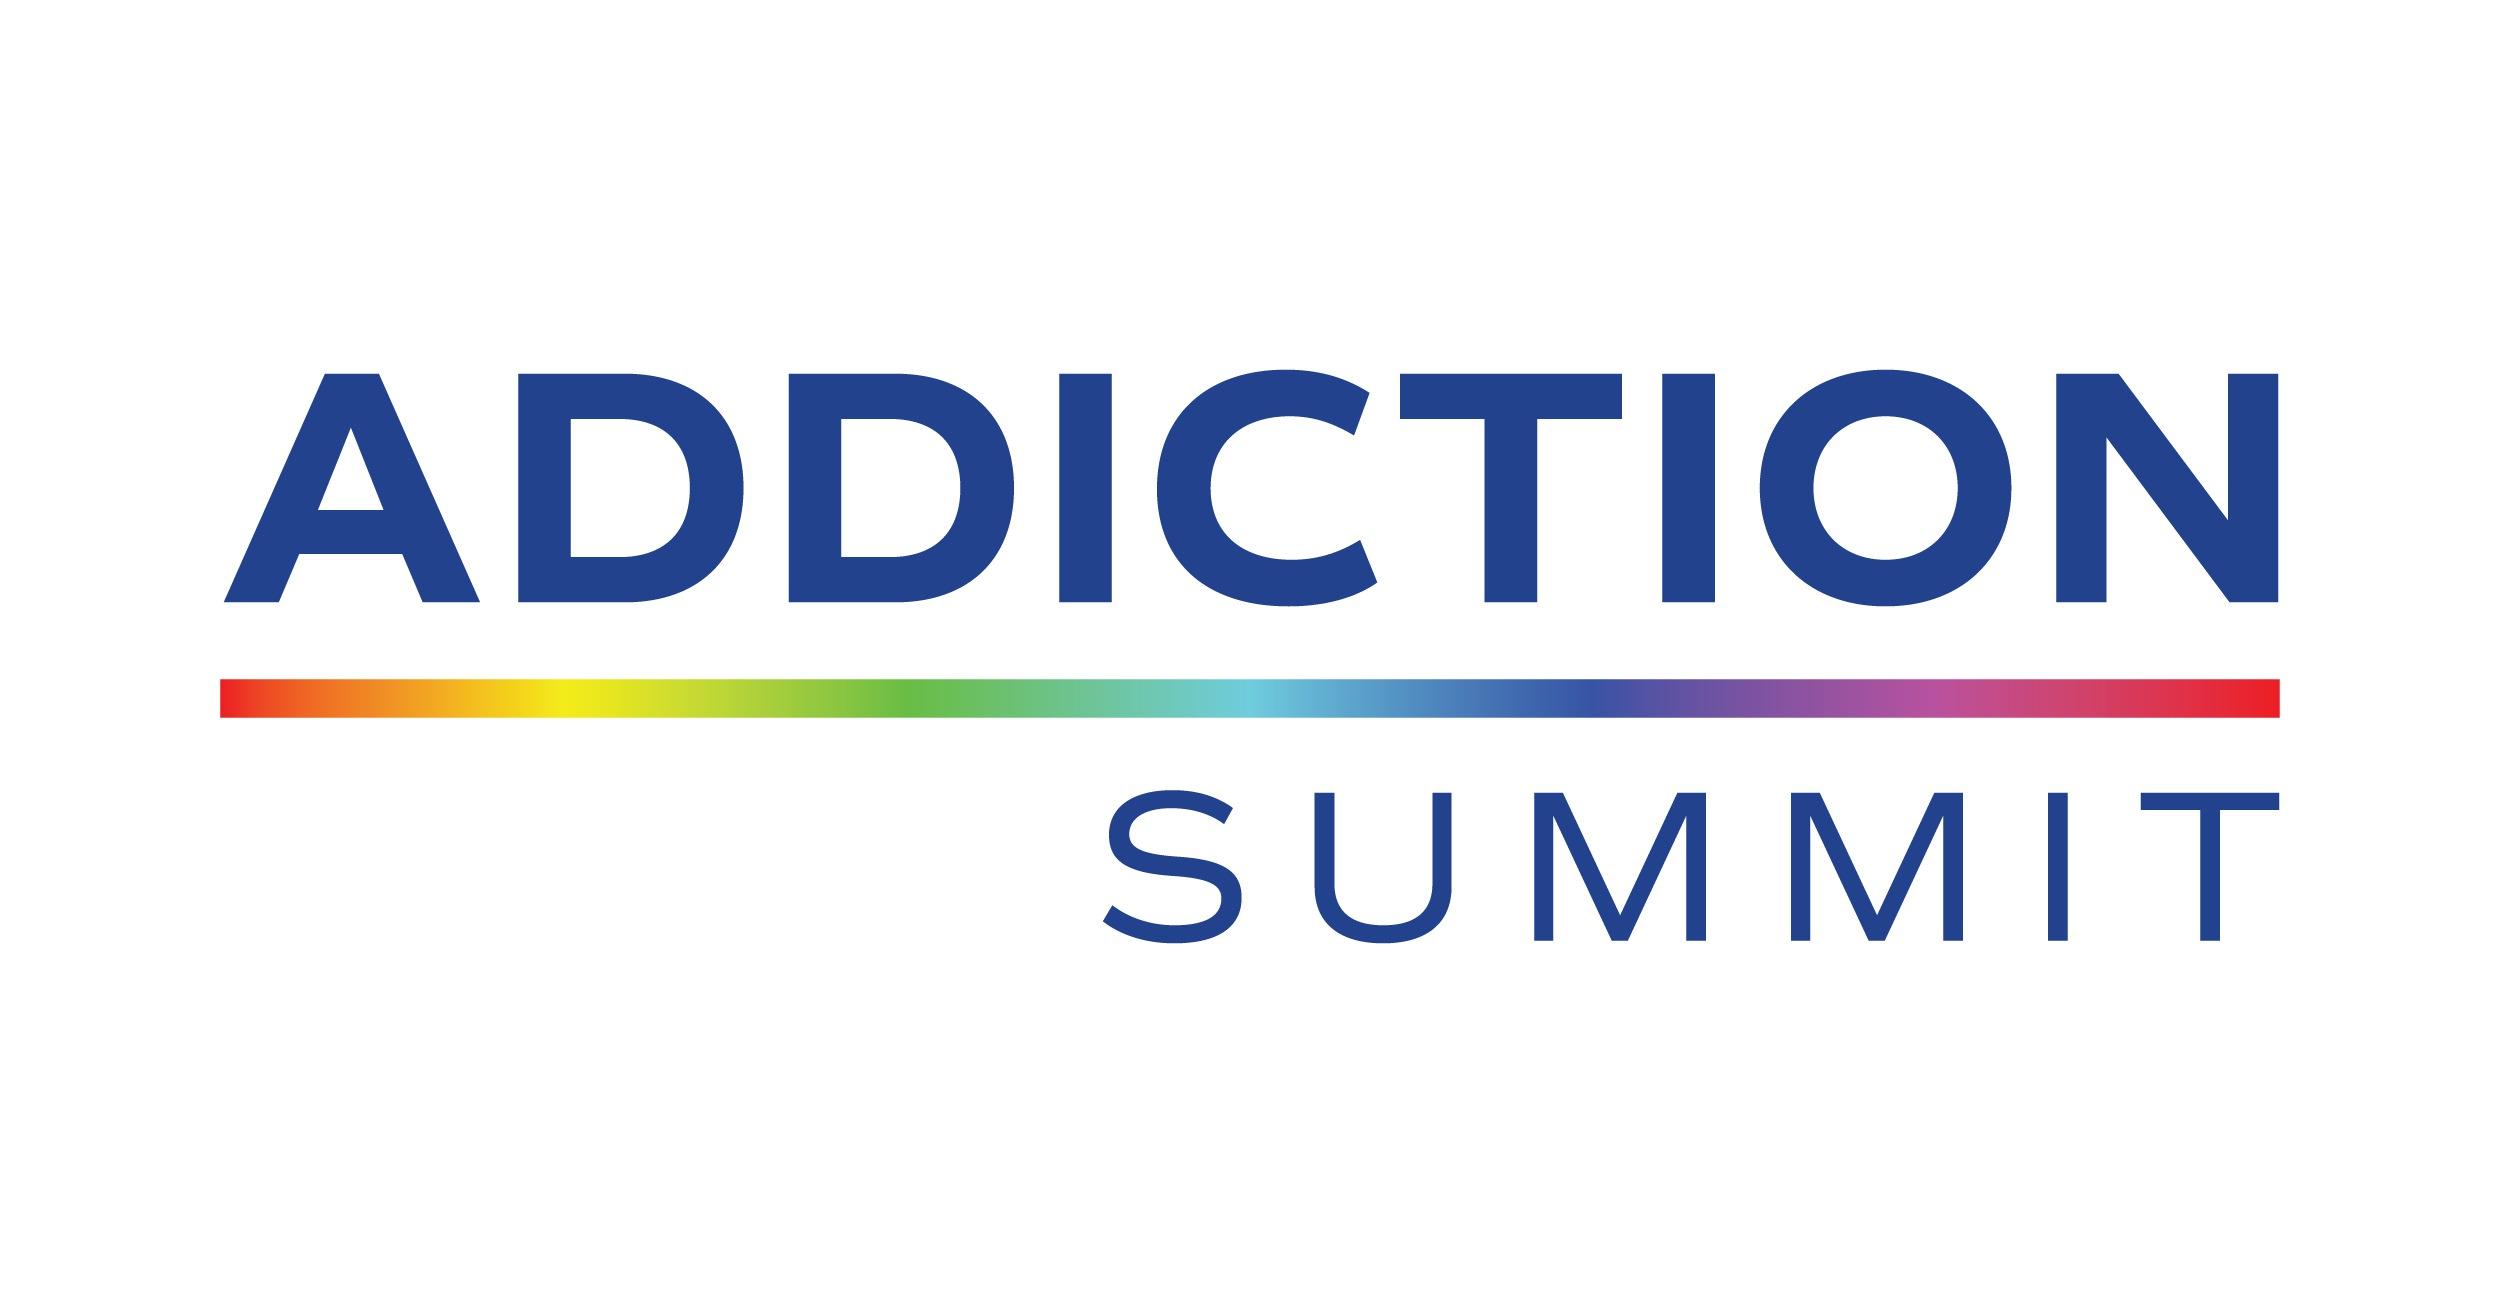 Addiction Summit | HealthMeans